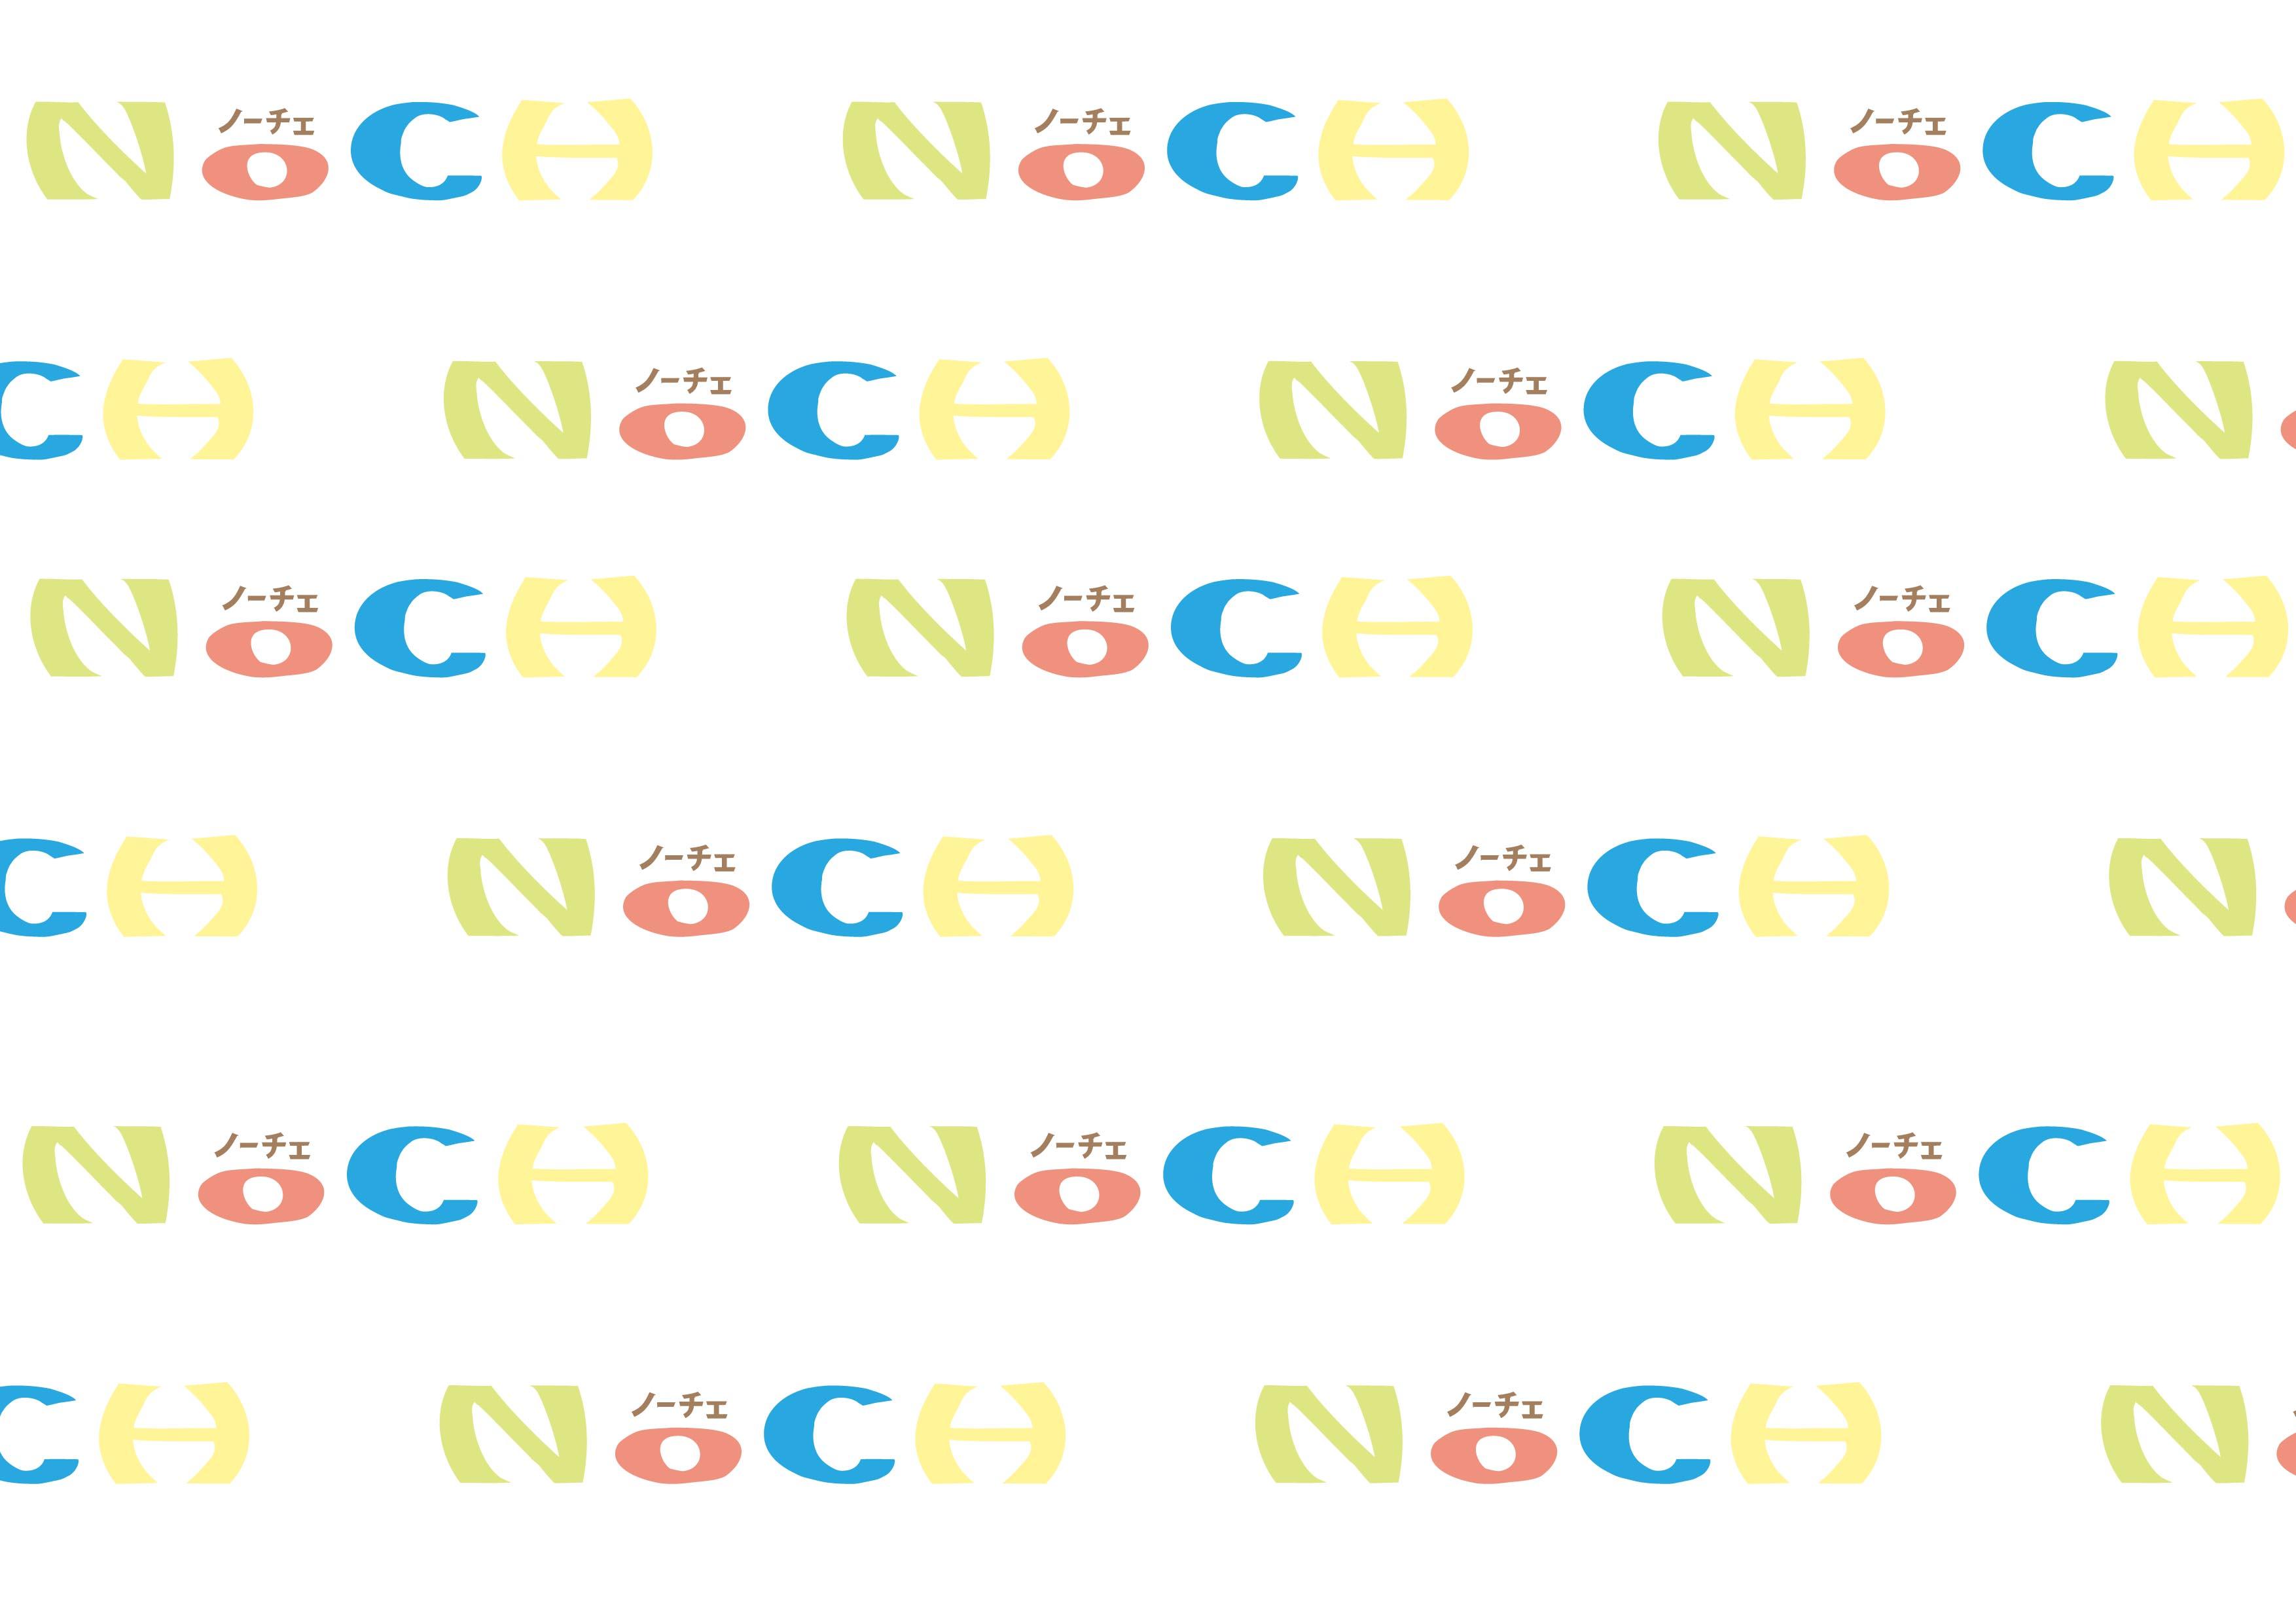 a0144908_2321632.jpg